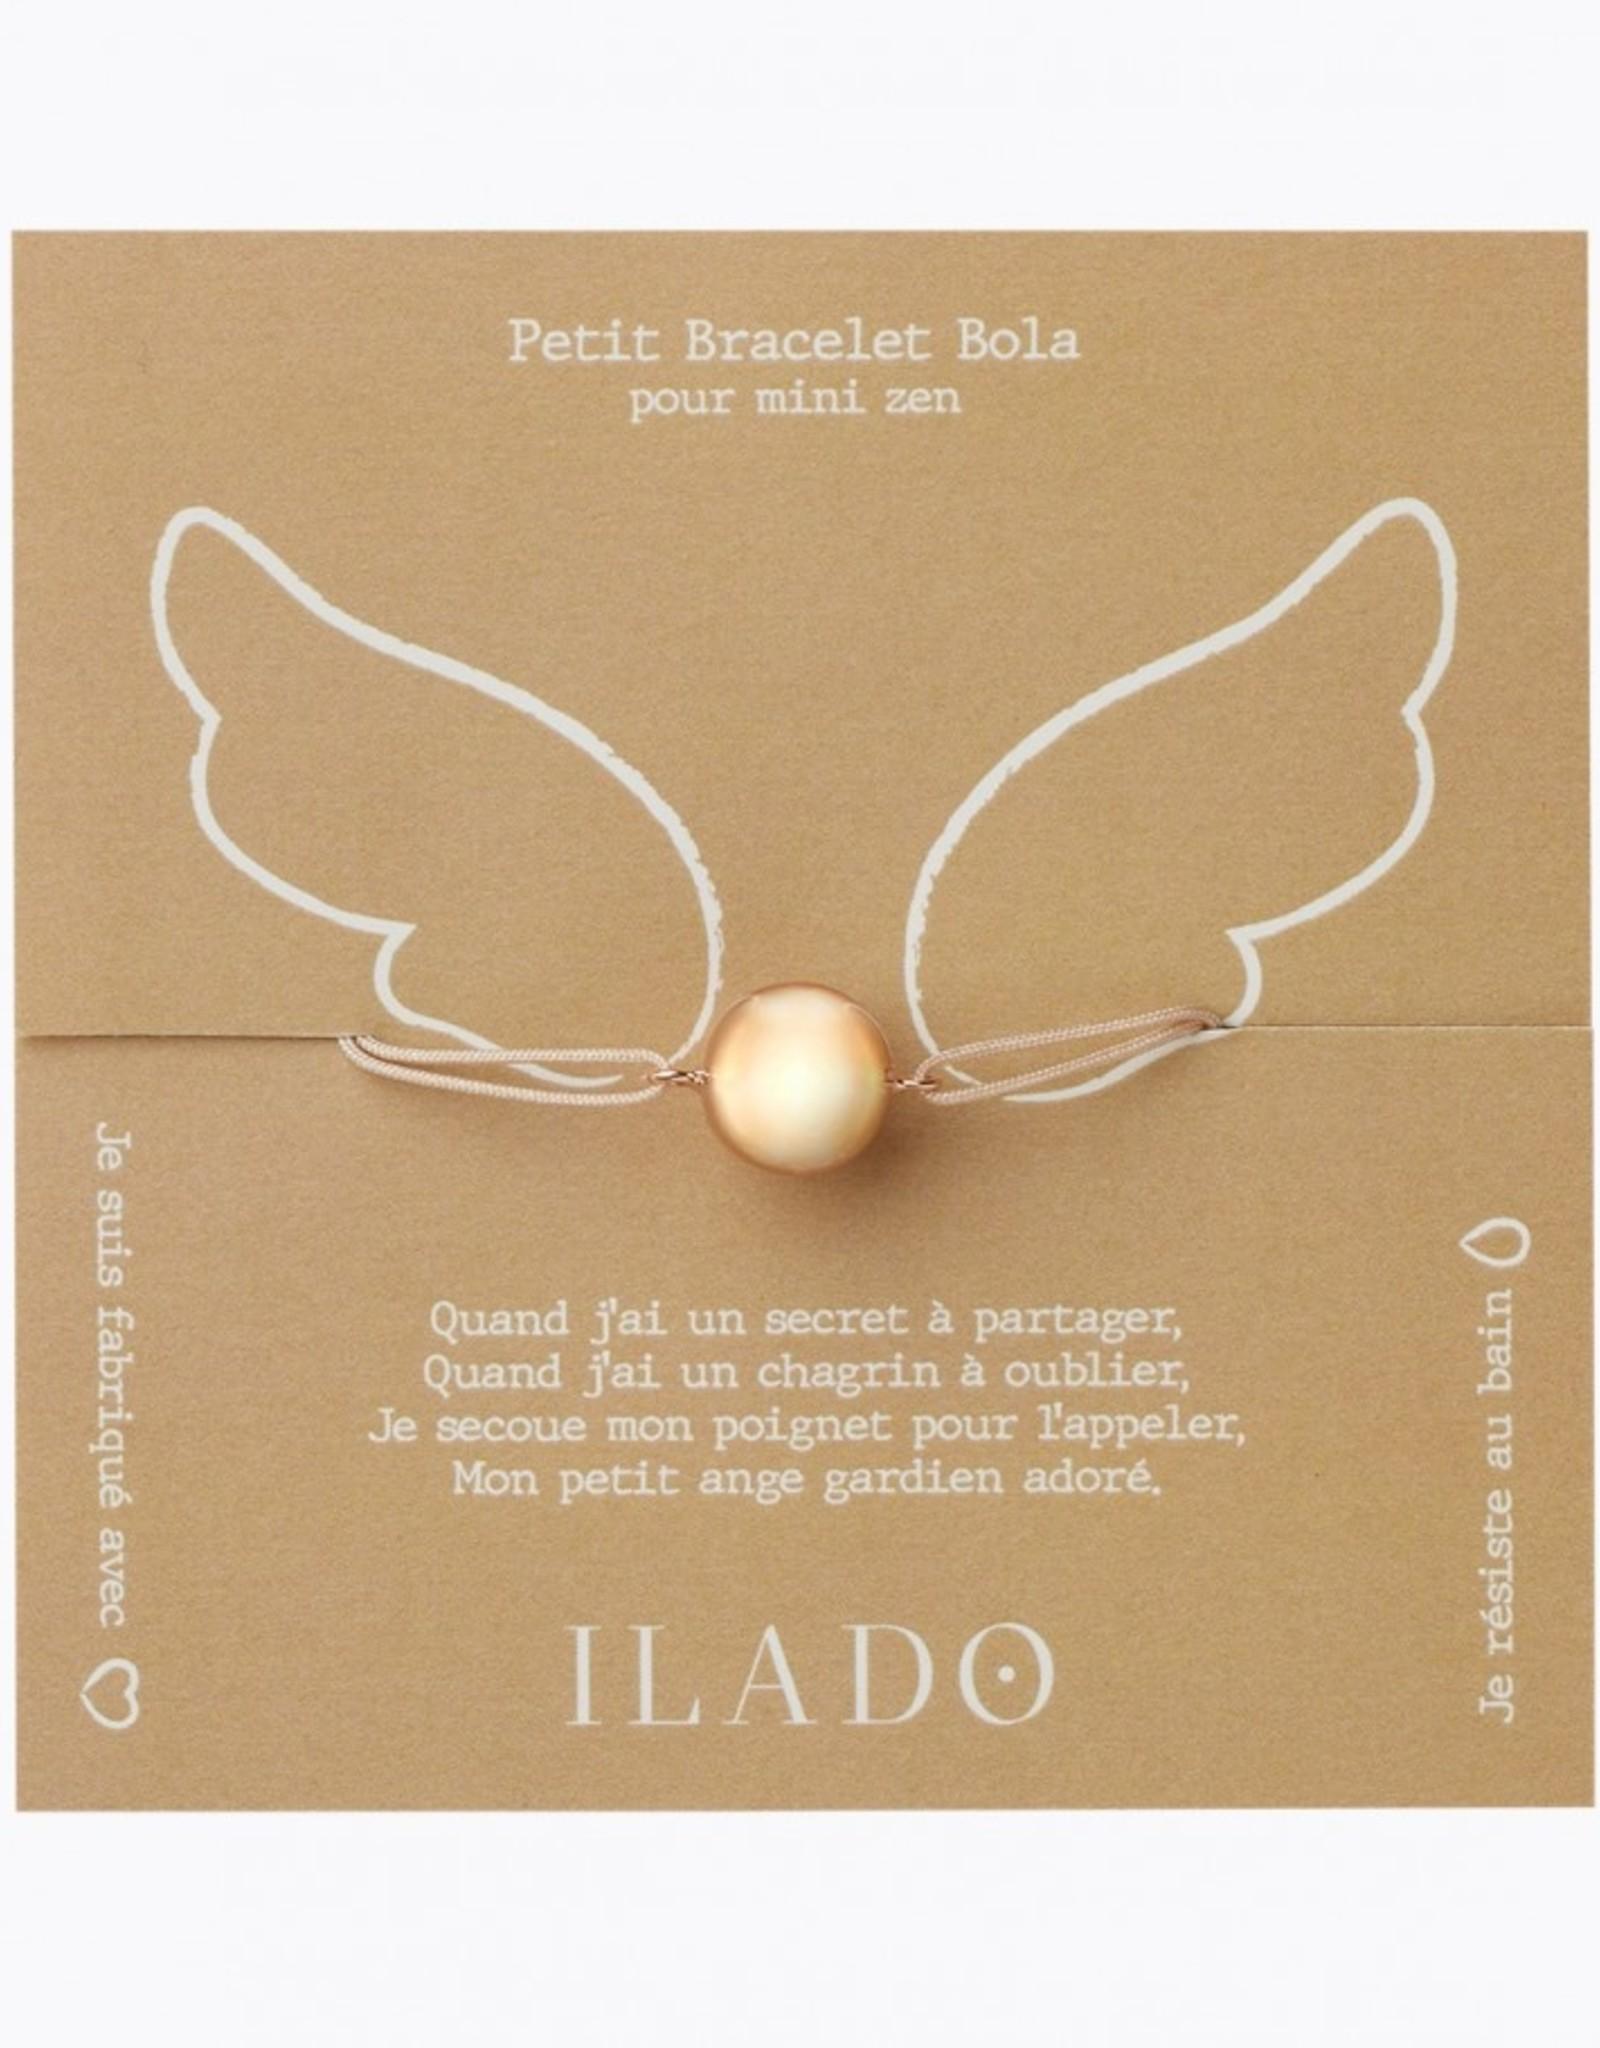 Ilado Mini Zen Angel Caller Bracelet